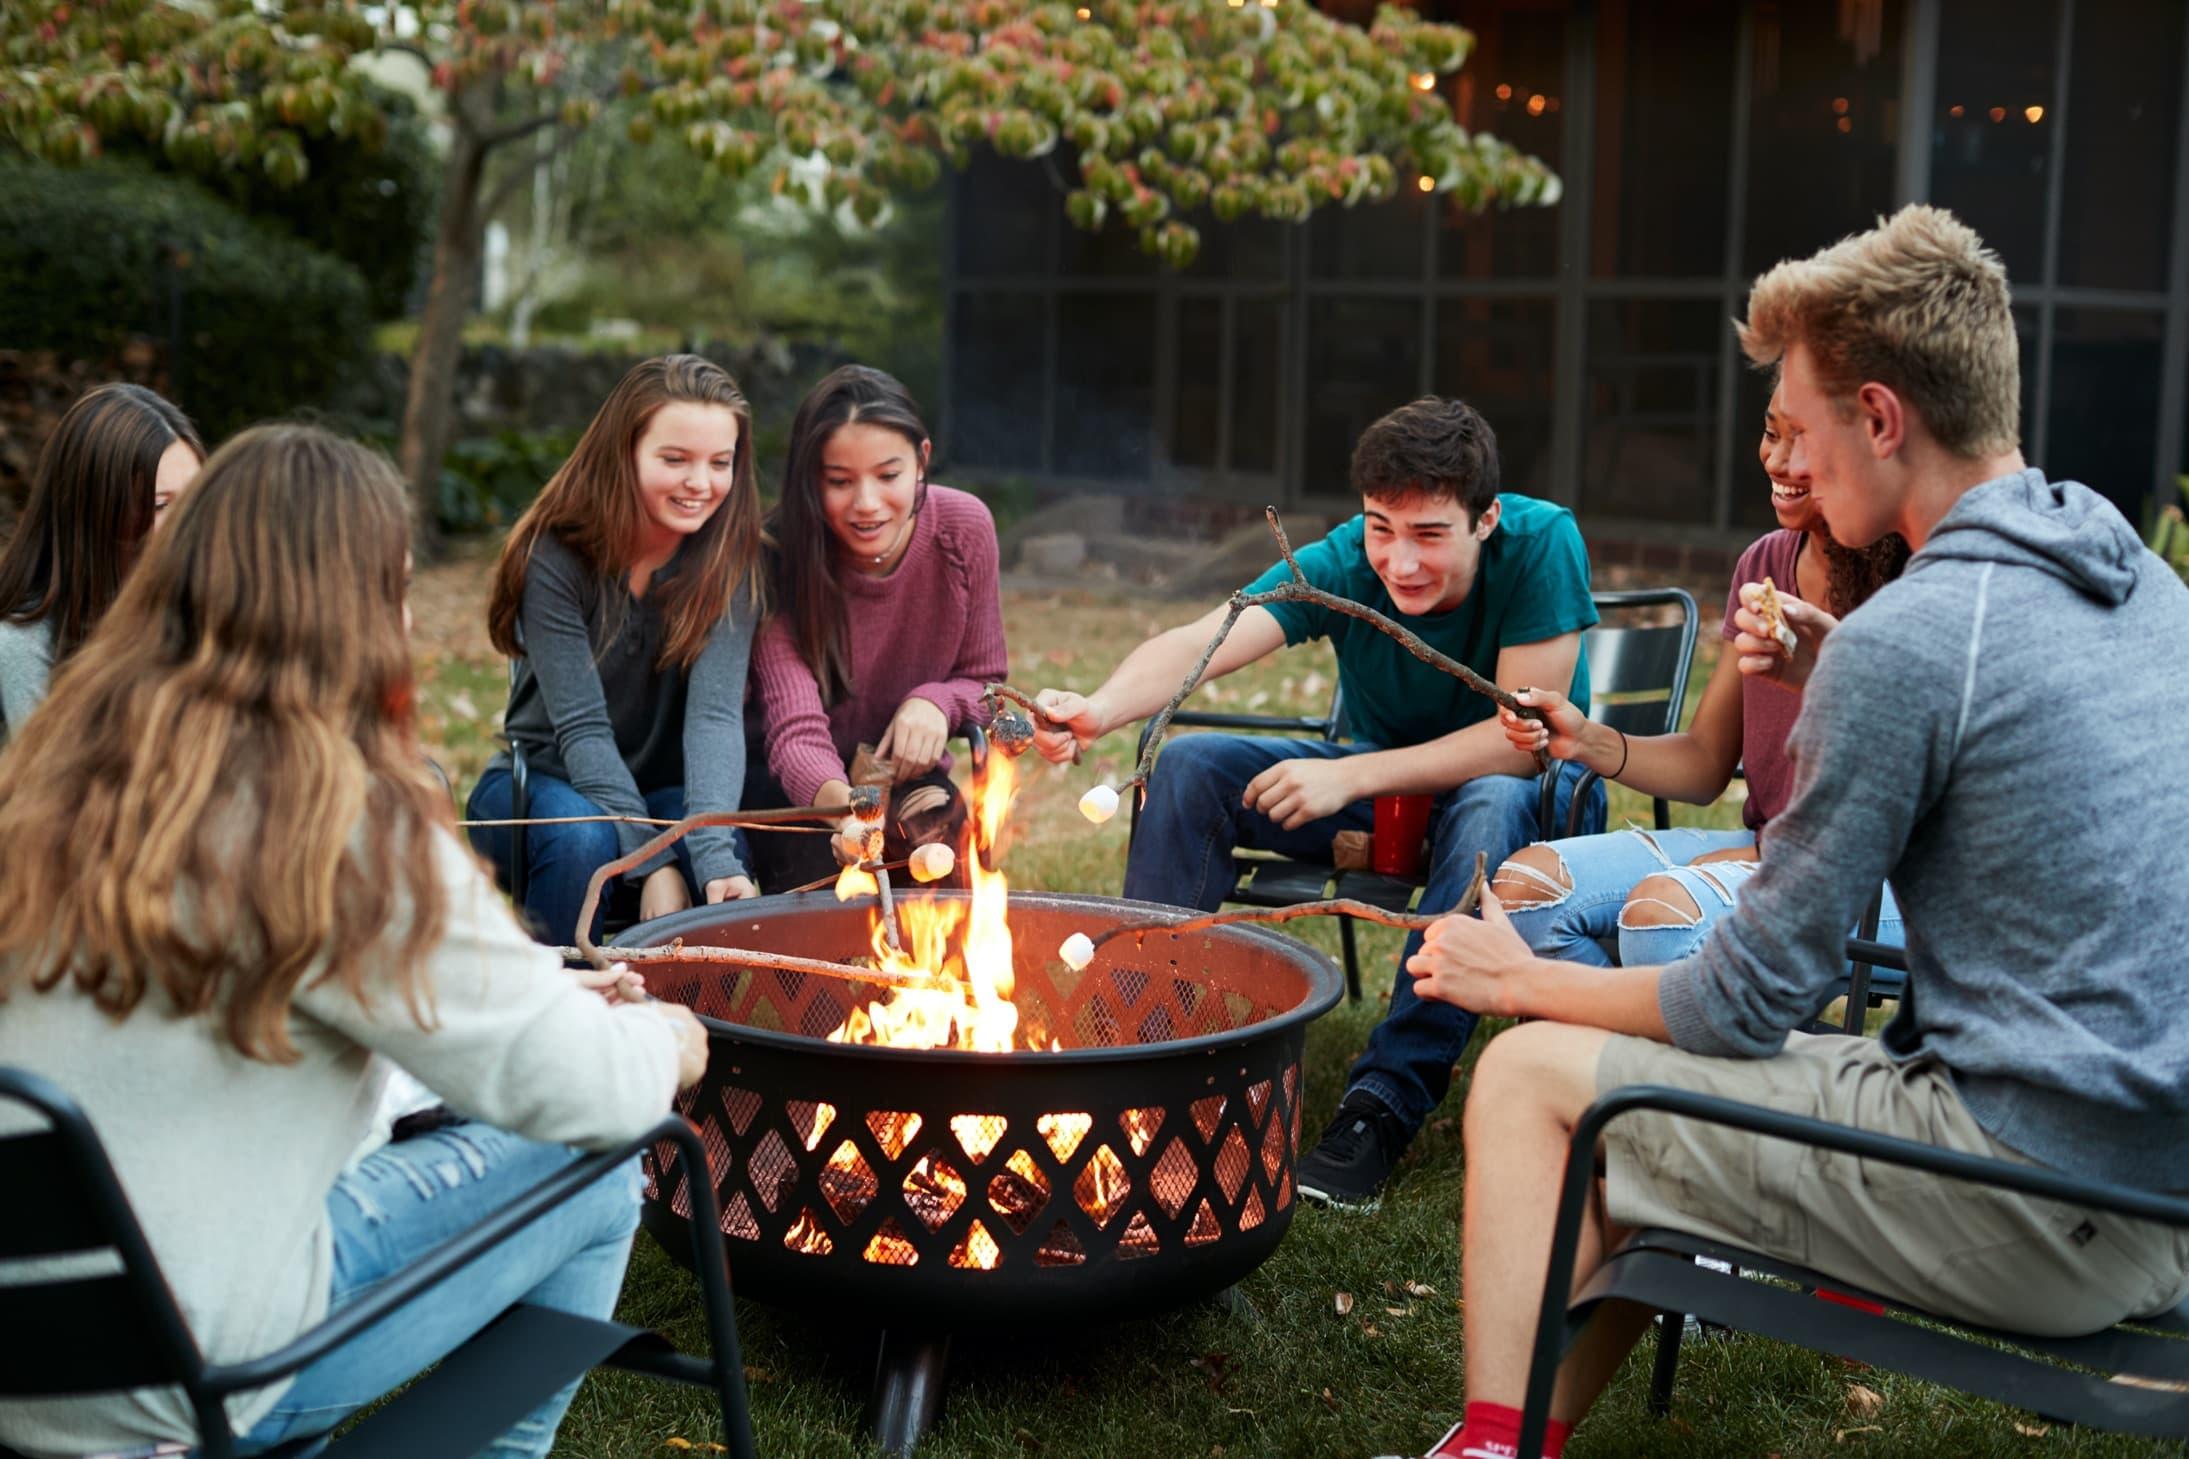 5 Best Fire Pits For Modern Garden Heating Horticulture Co Uk